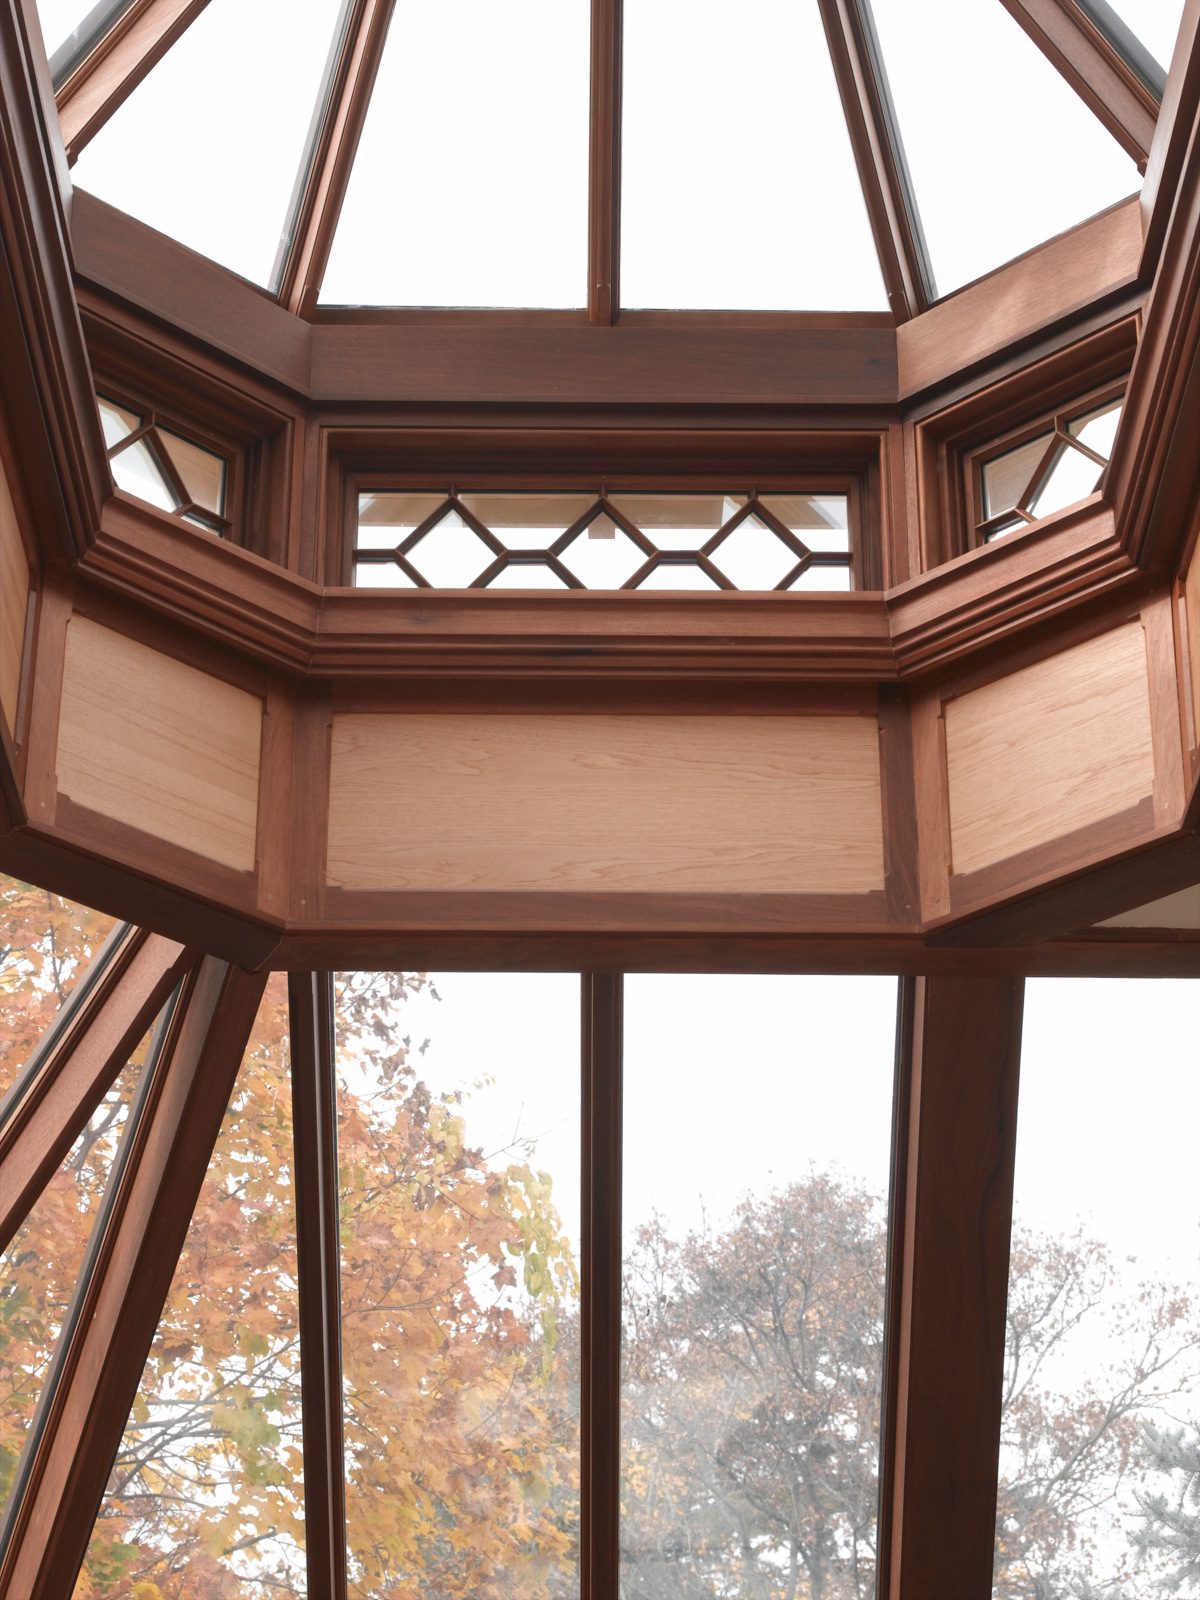 Conservatory Int HiR 007.jpg